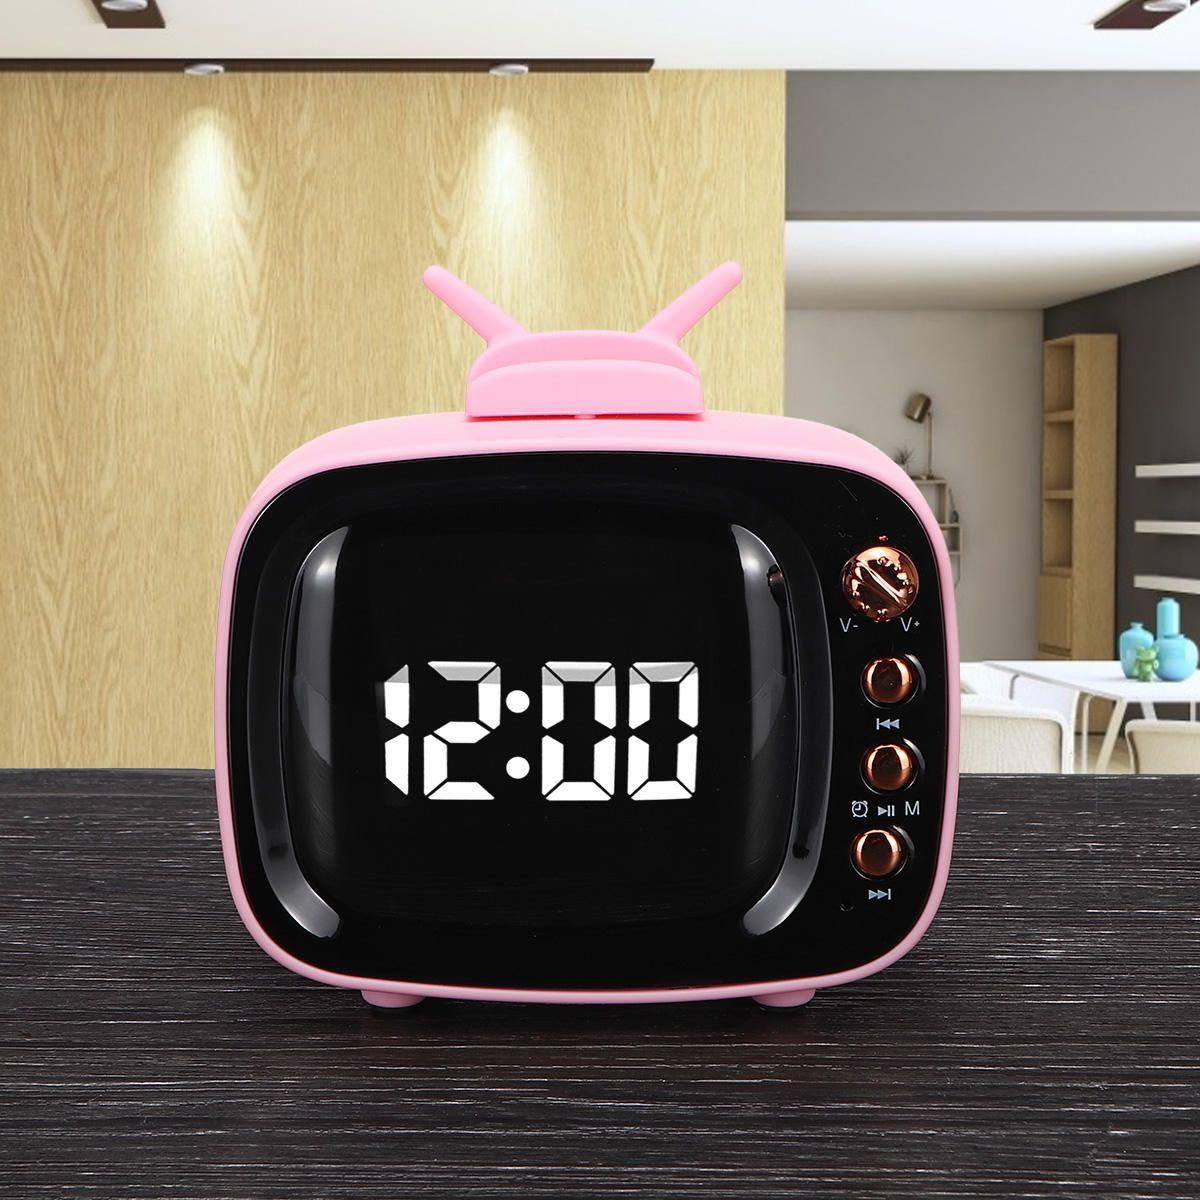 VLN US$14.99 Portable Retro Speaker TV Design Mobile Phone Holder Stand bluetooth Alarm Clock